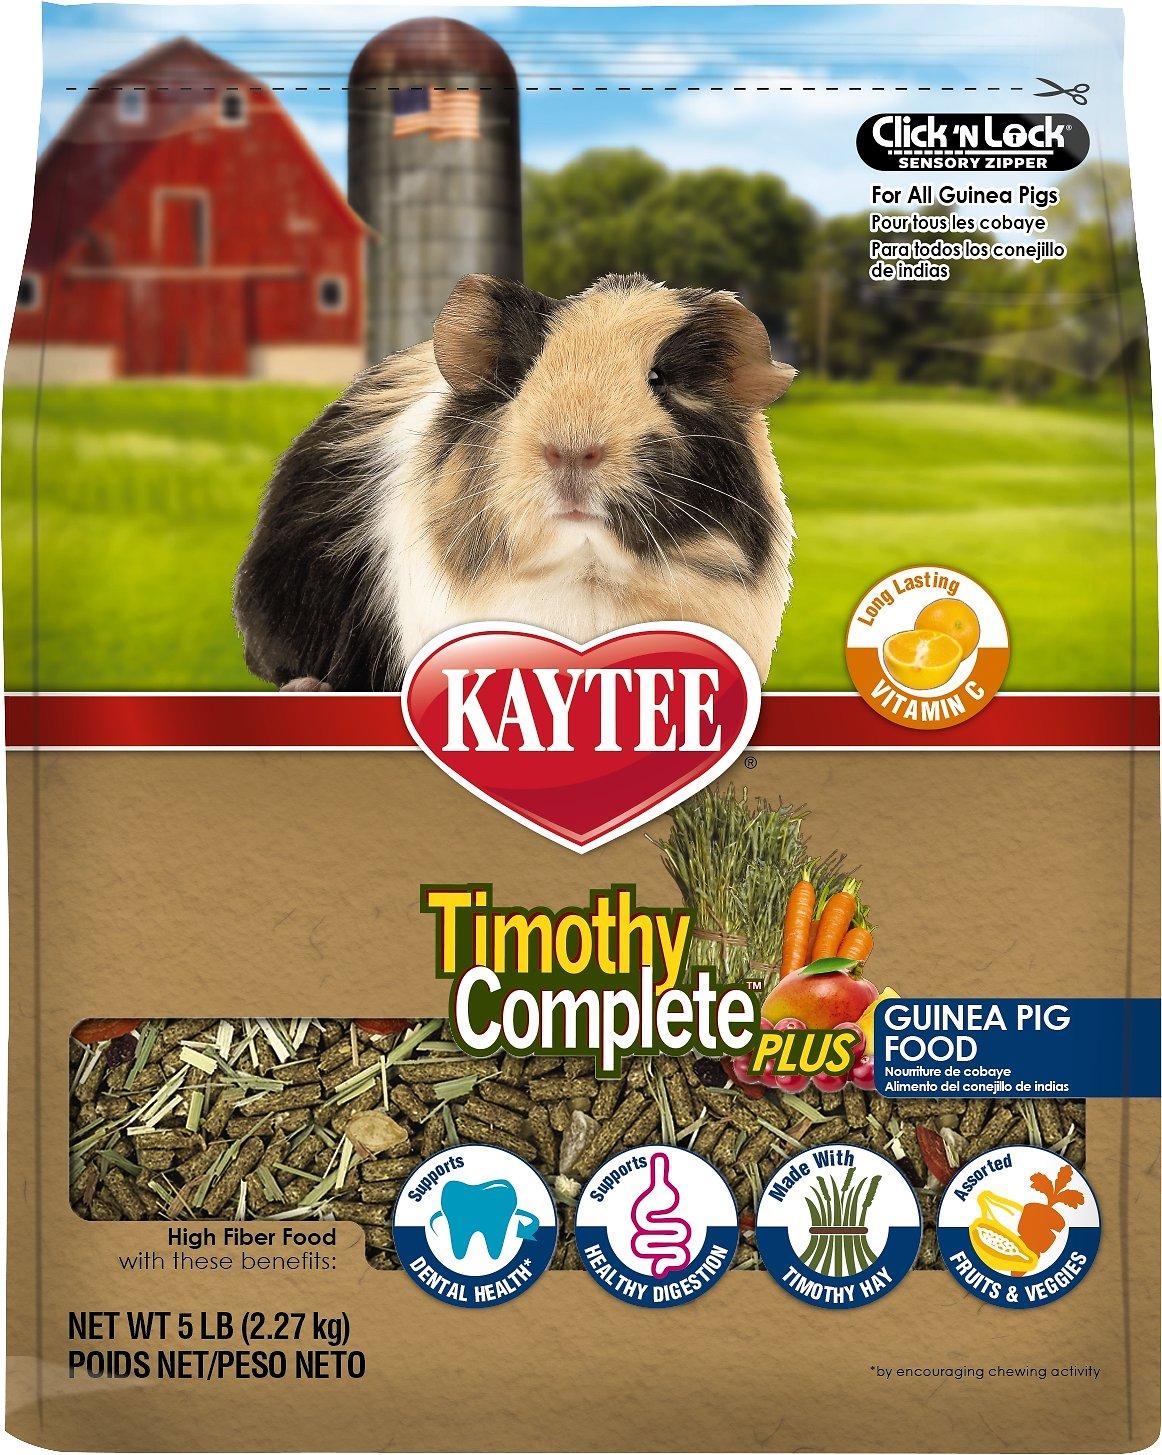 Kaytee Timothy Complete Plus Fruits & Veggies Fiber Diet Guinea Pig Food, 5-lb bag